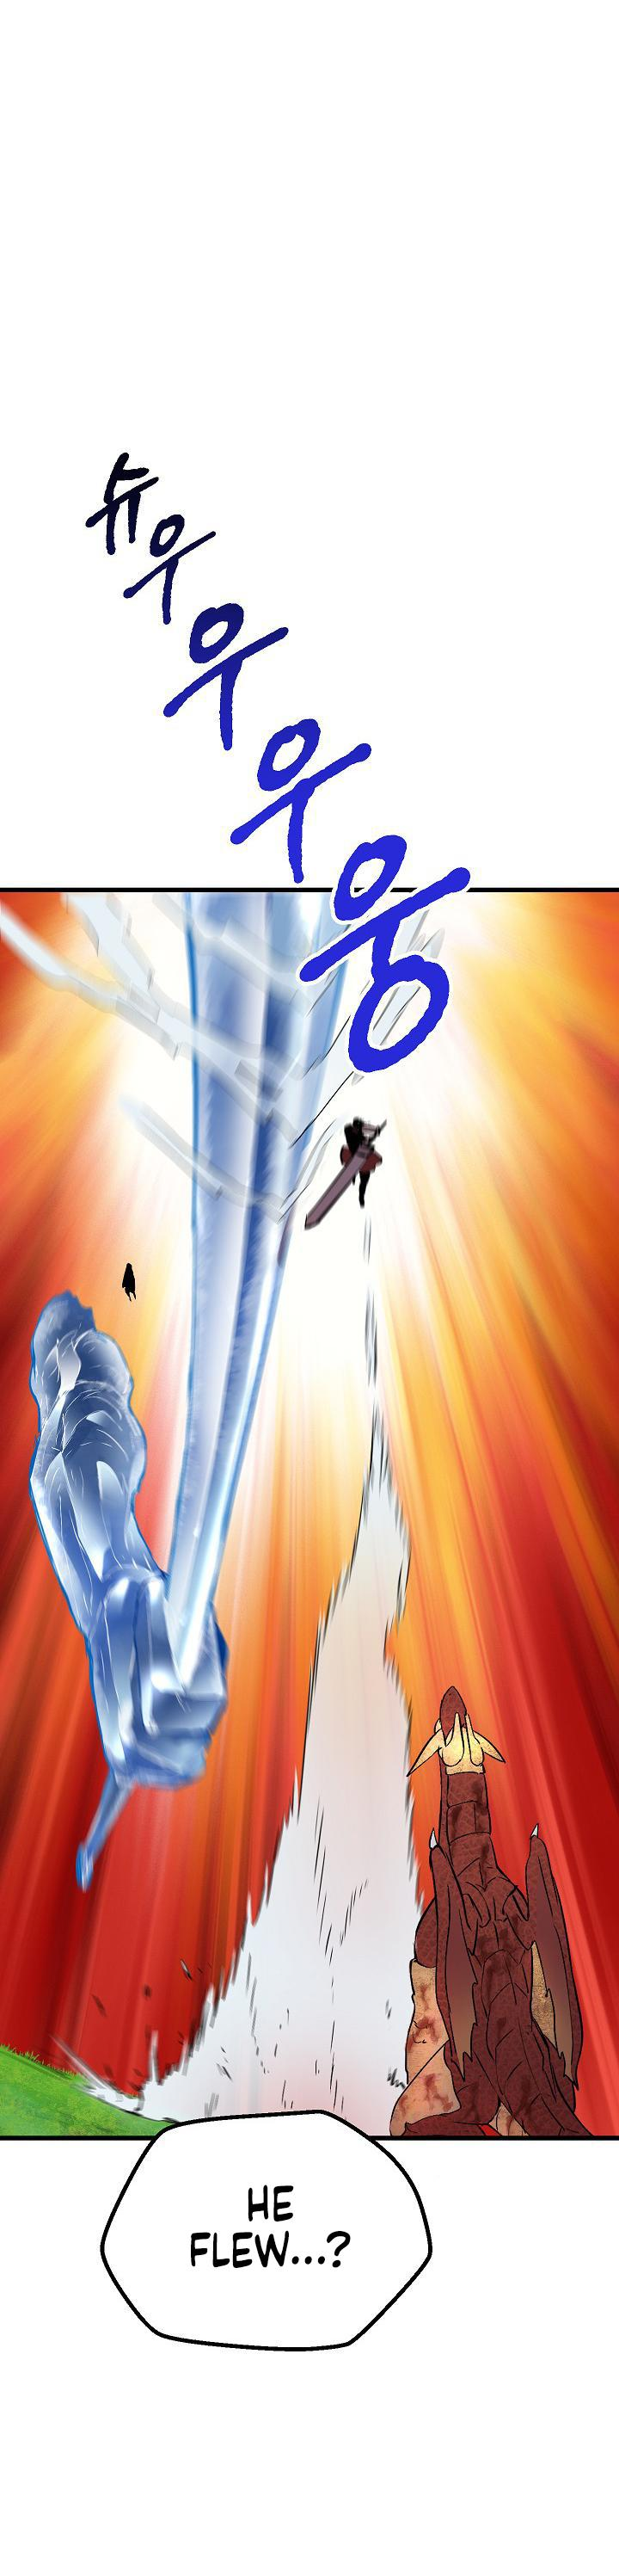 Survival Story Of A Sword King In A Fantasy World Vol.1 Chapter 19 page 23 - Mangakakalots.com